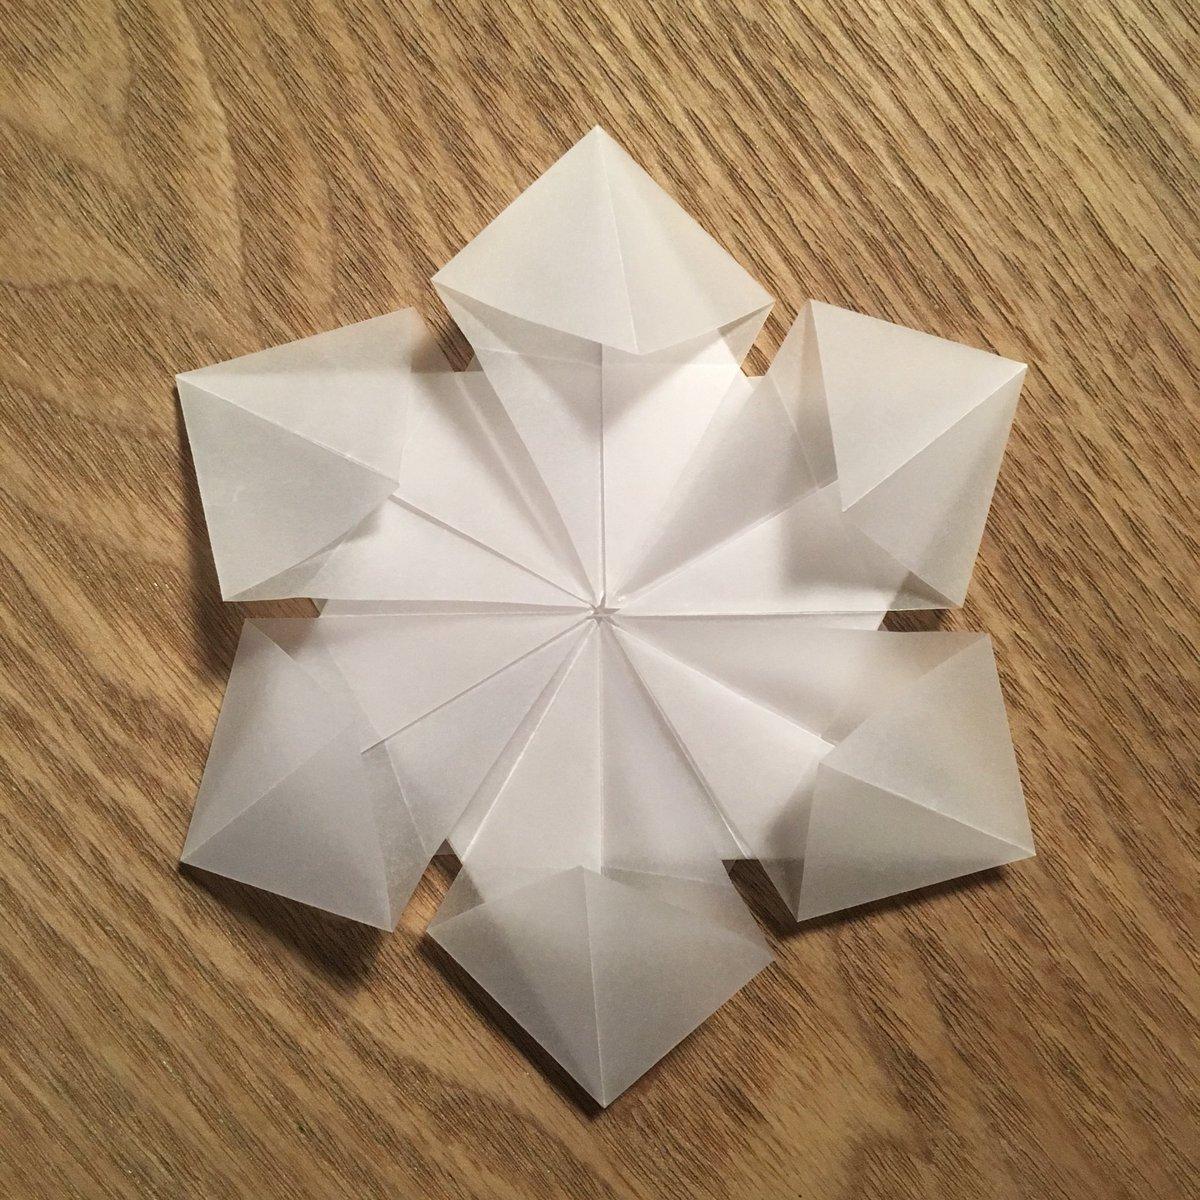 Clarissa Grandi On Twitter Fryrsquared Origami Snowflakes